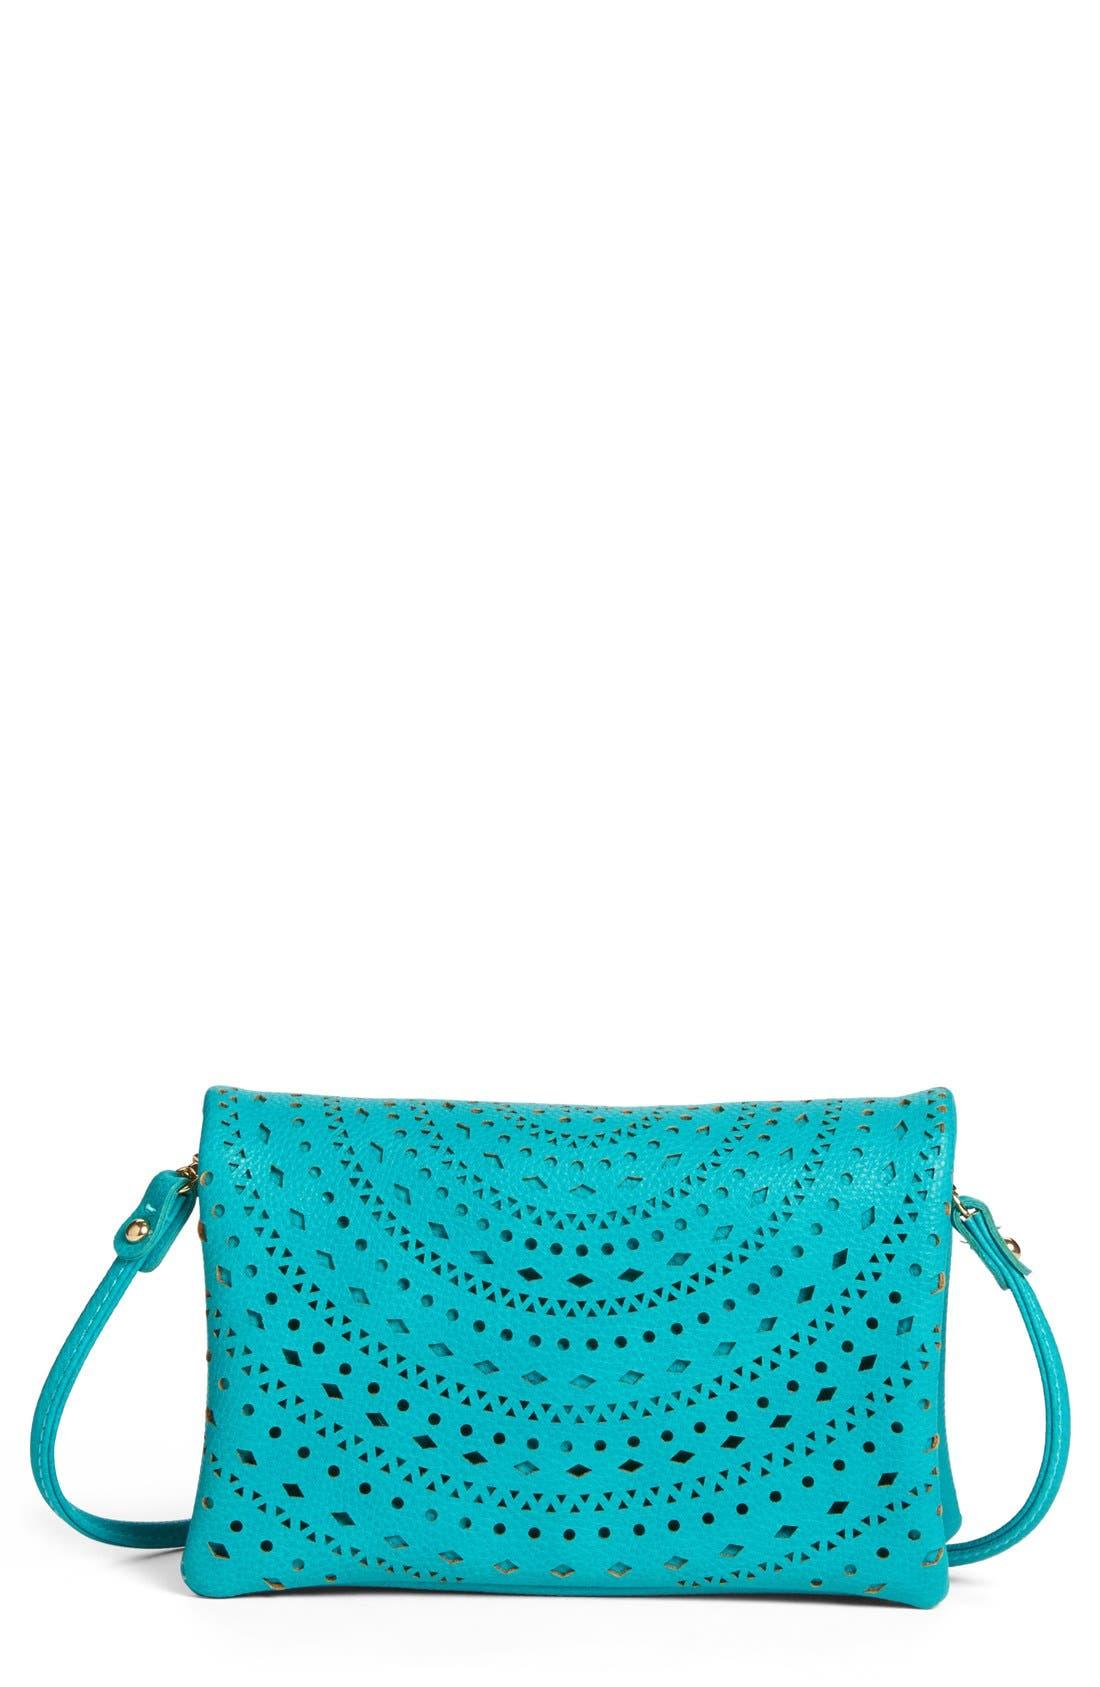 Main Image - Street Level Perforated Faux Leather Mini Crossbody Bag